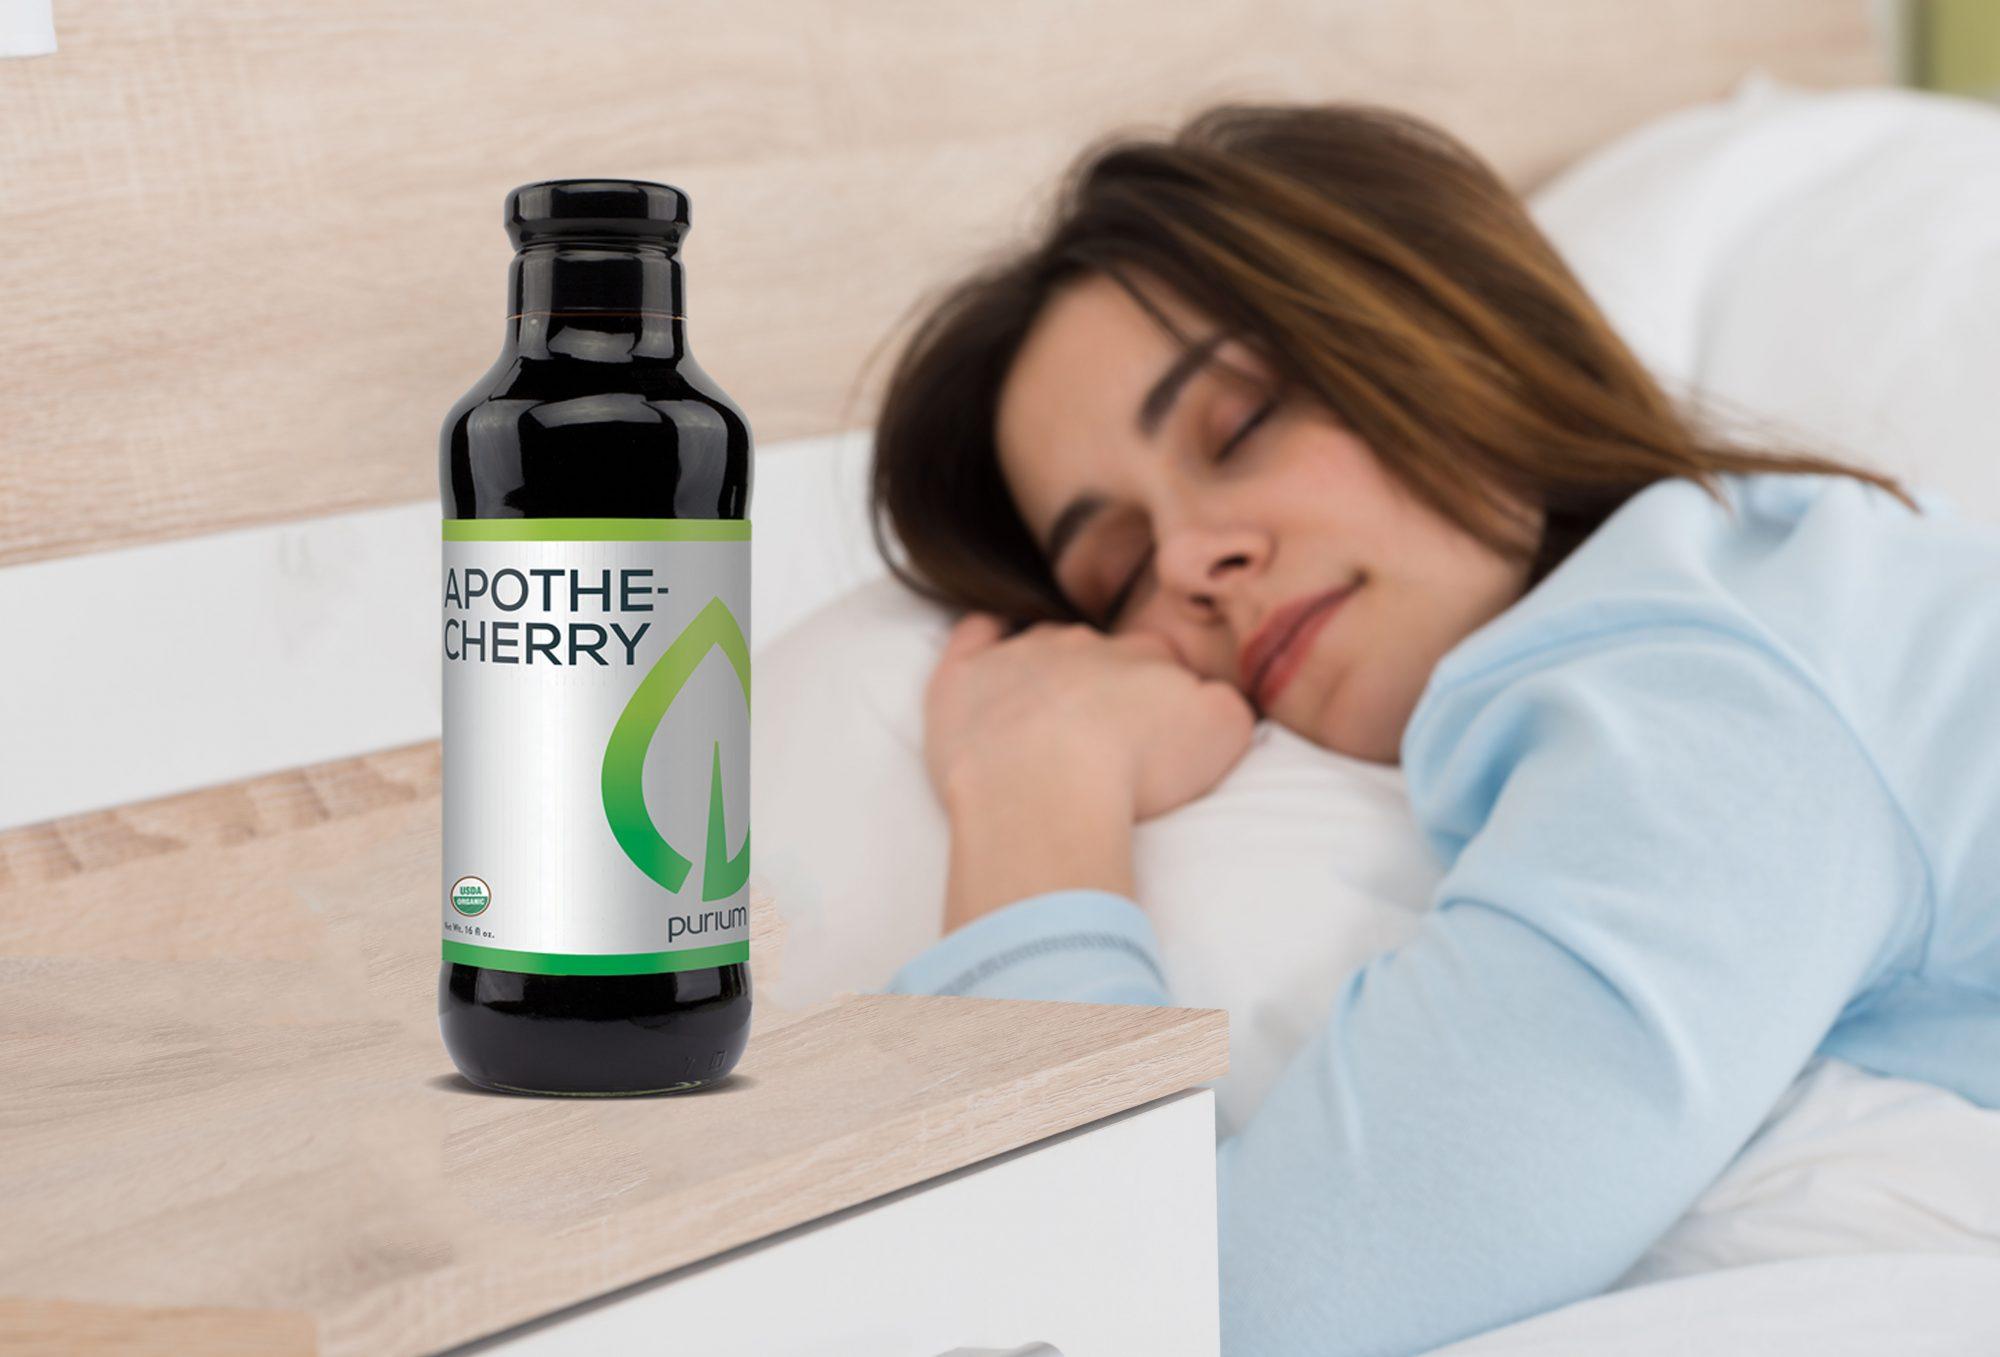 Dream on with Apothe-Cherry